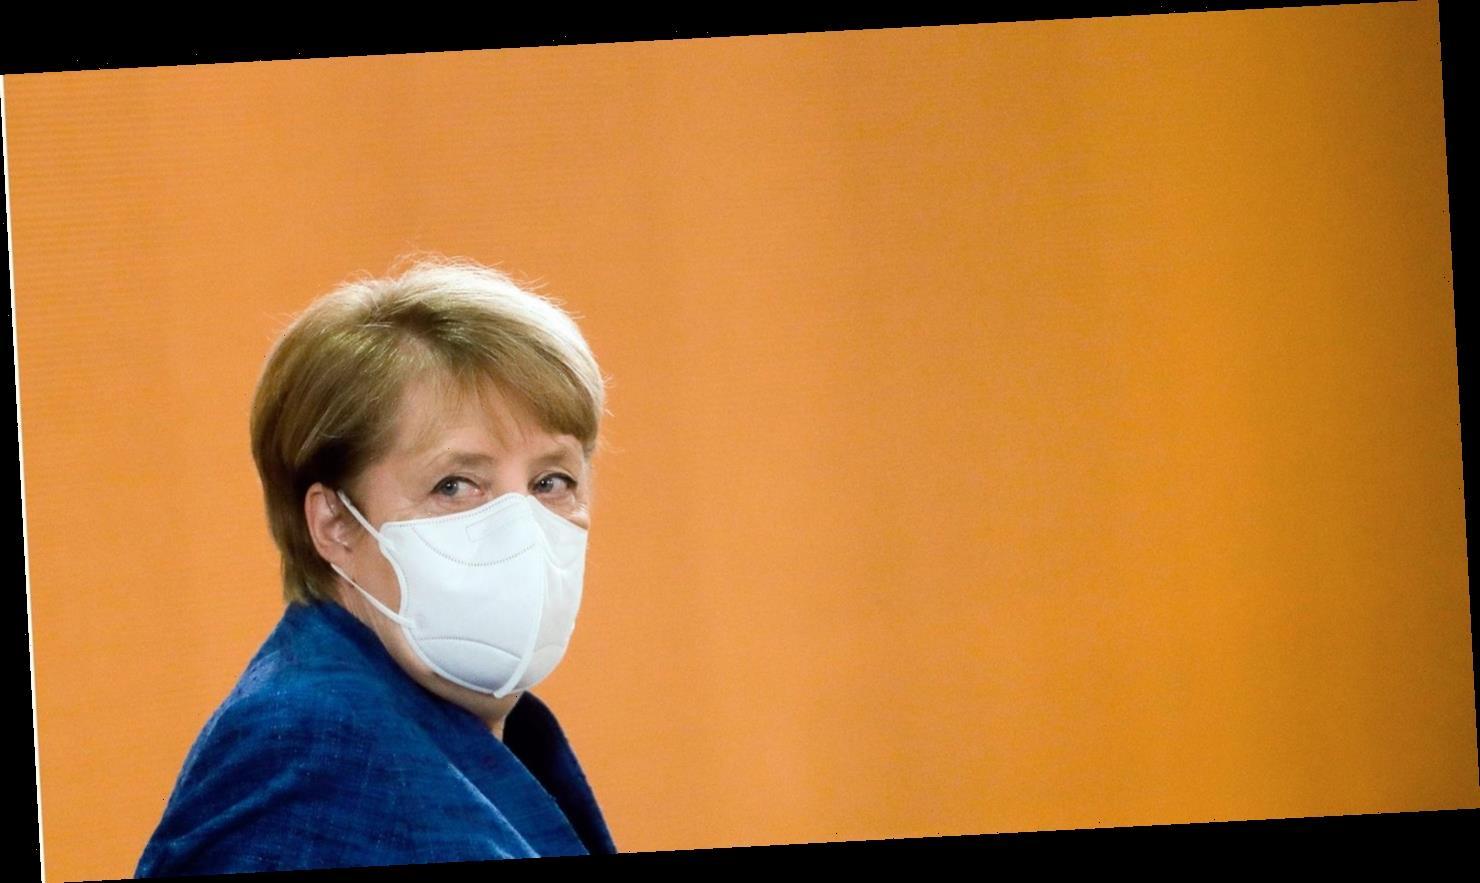 Hunderte Polizisten im Einsatz: Berlin verschärft Corona-Kontrollen